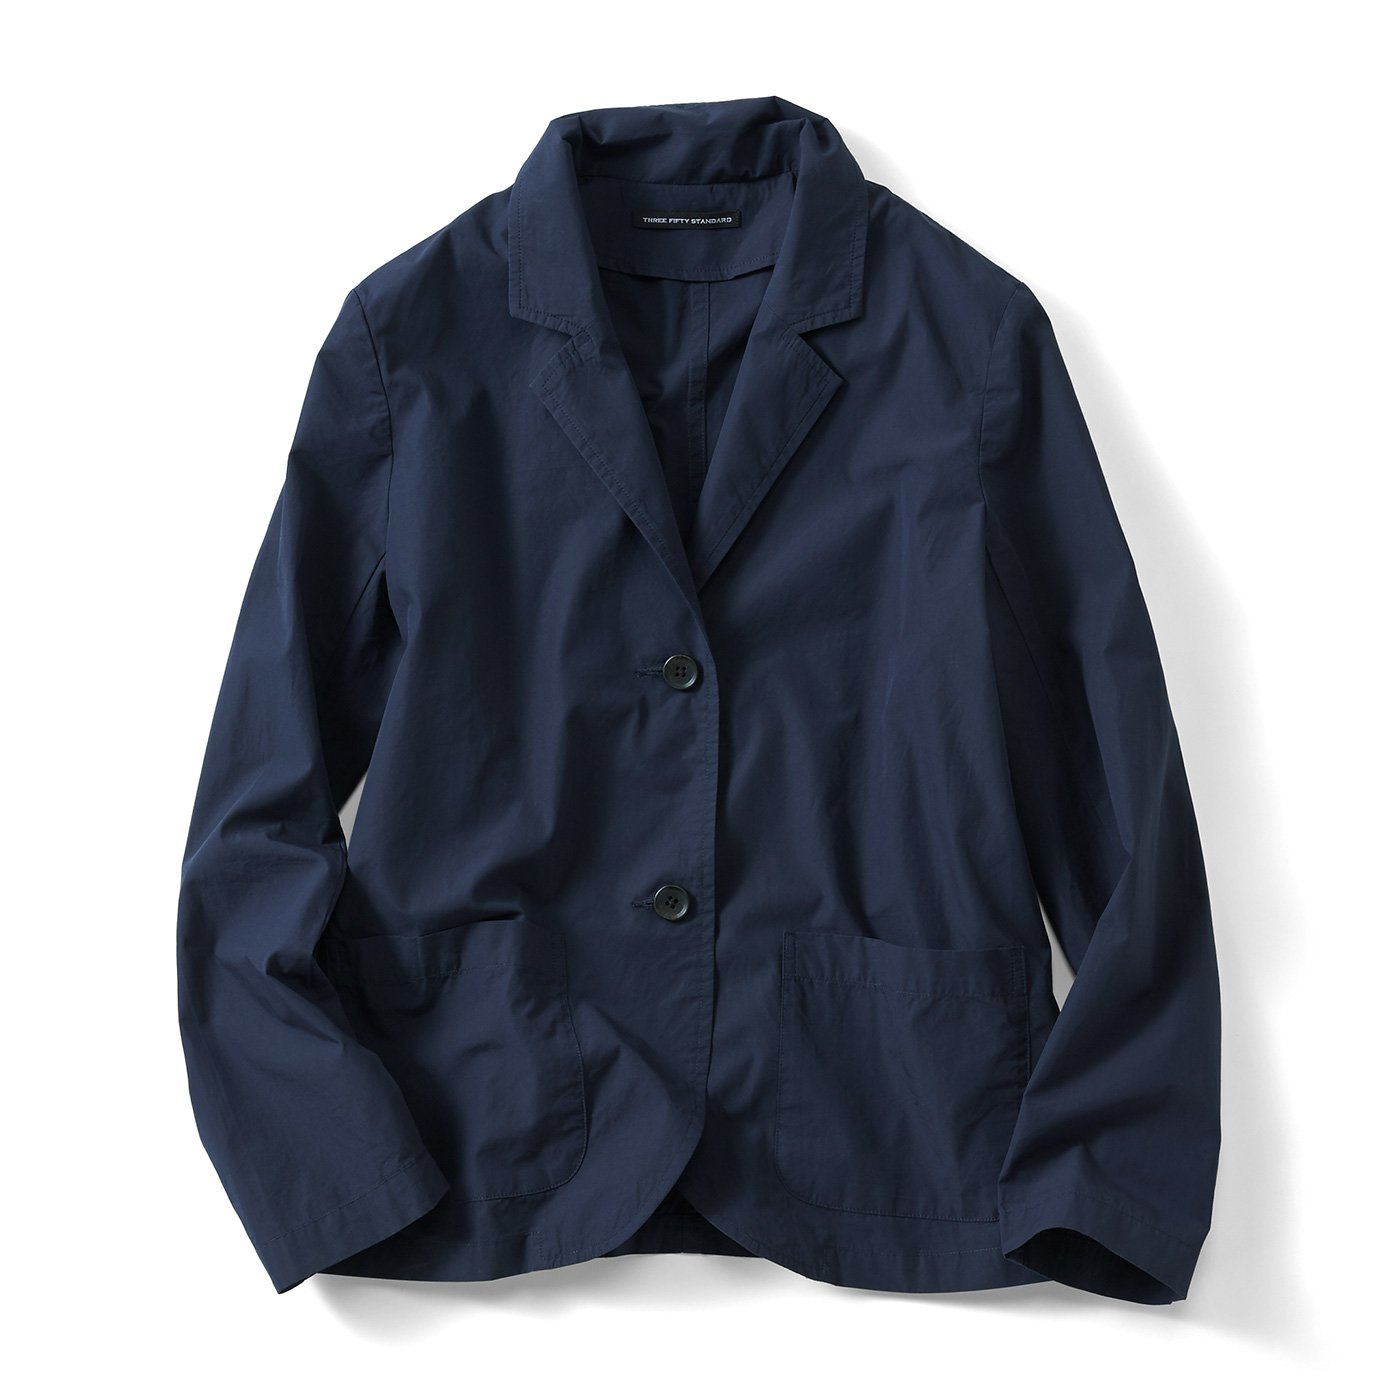 THREE FIFTY STANDARD 薄くて軽い一枚仕立てのテーラードジャケット〈ネイビー〉